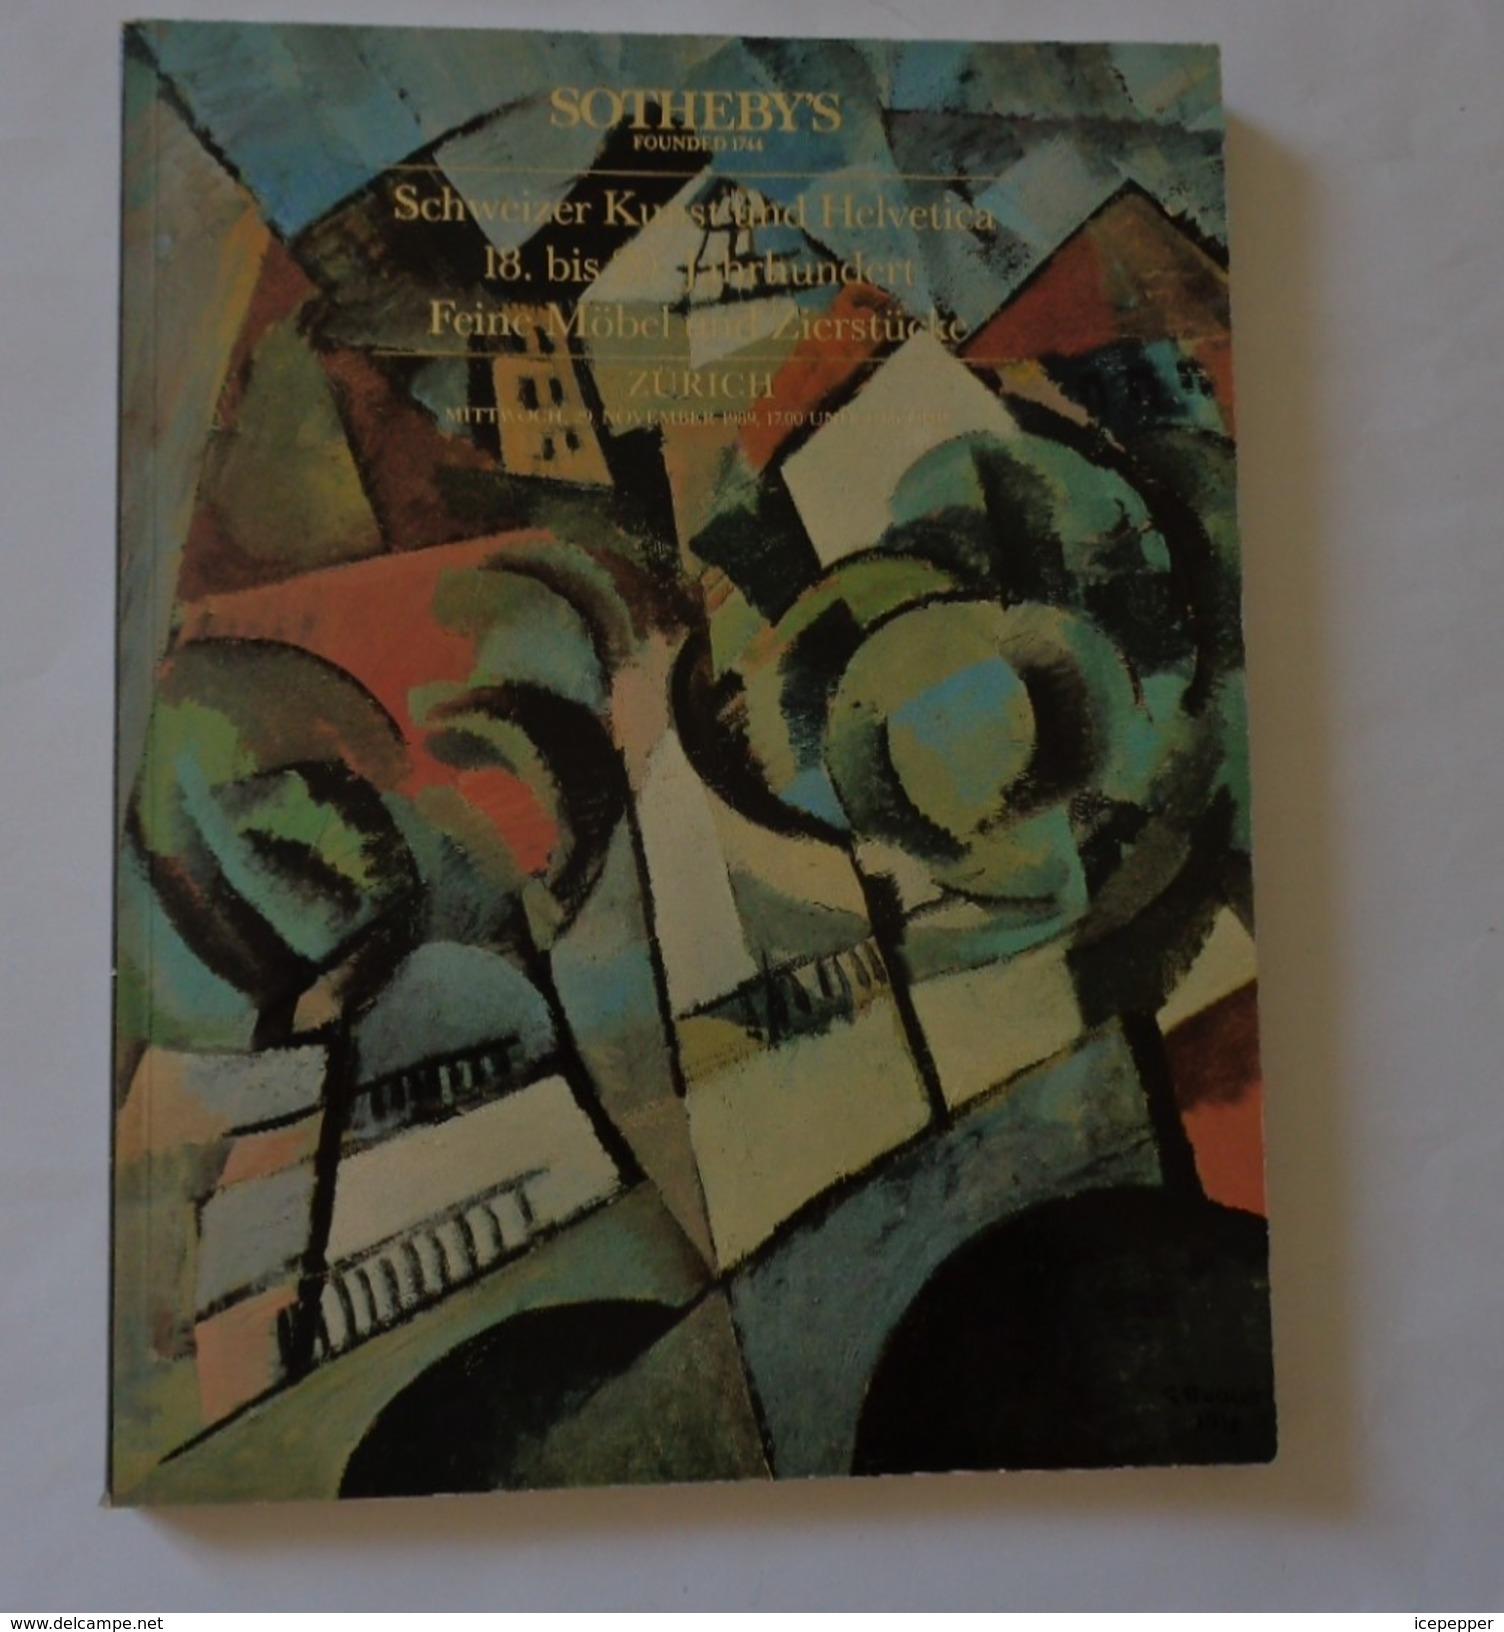 Sotheby's  Zurich 29-11-1989 Art Auction Schweizer Kuntz Und Hevetica 18-20e   Peintures,objets Et Meubles - Catalogues